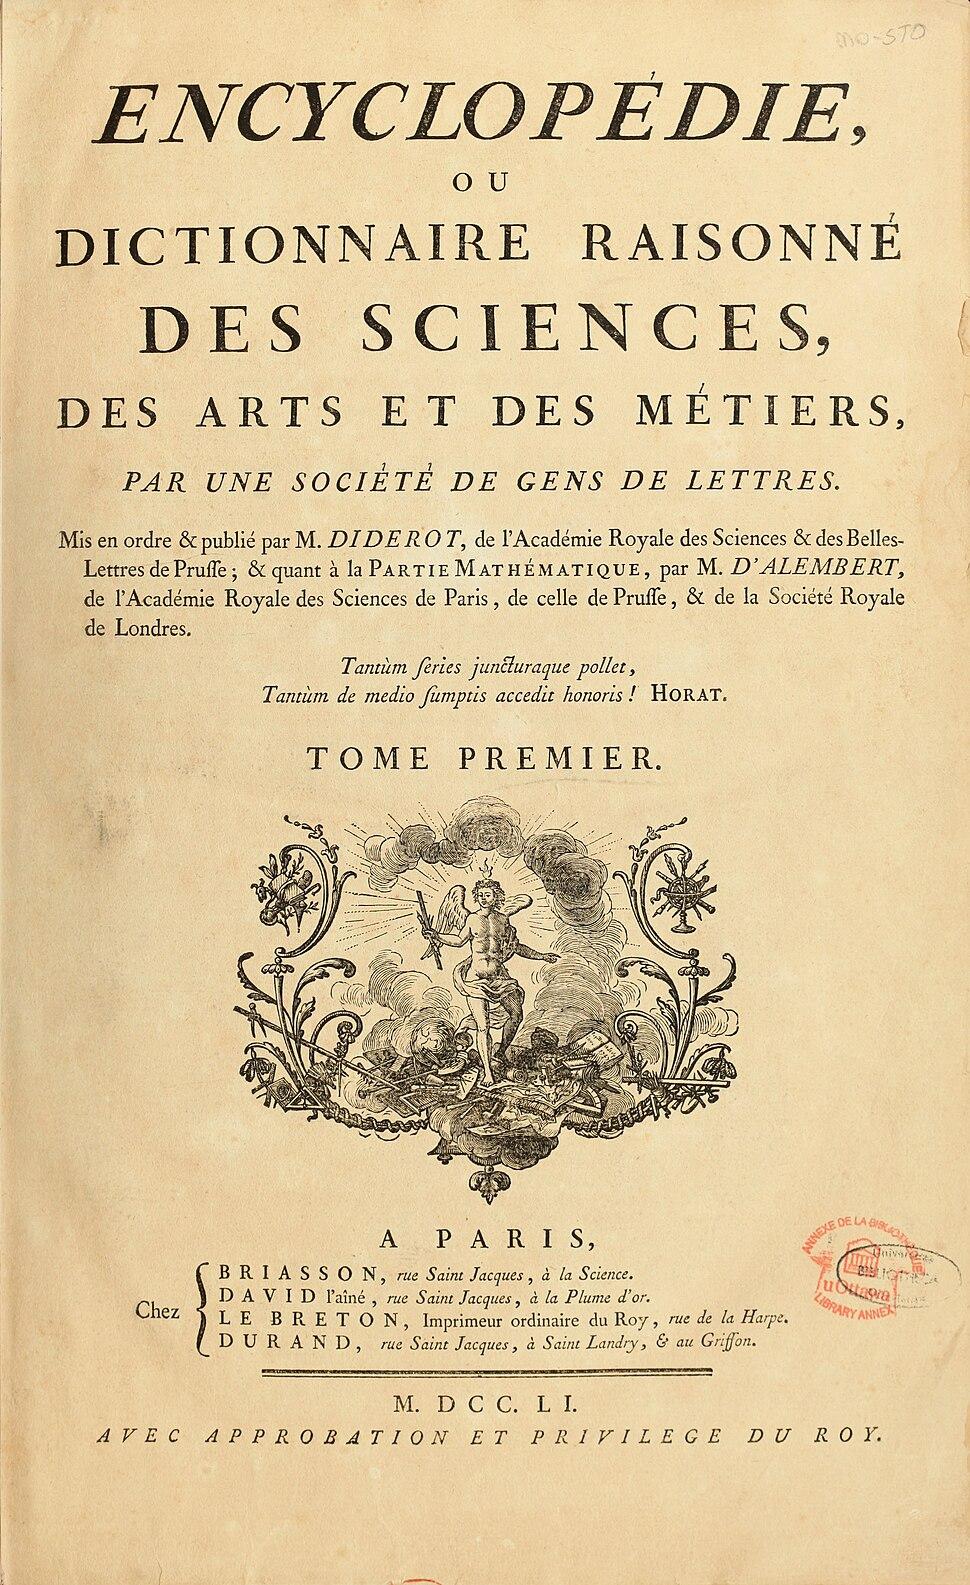 Encyclopedie de D%27Alembert et Diderot - Premiere Page - ENC 1-NA5